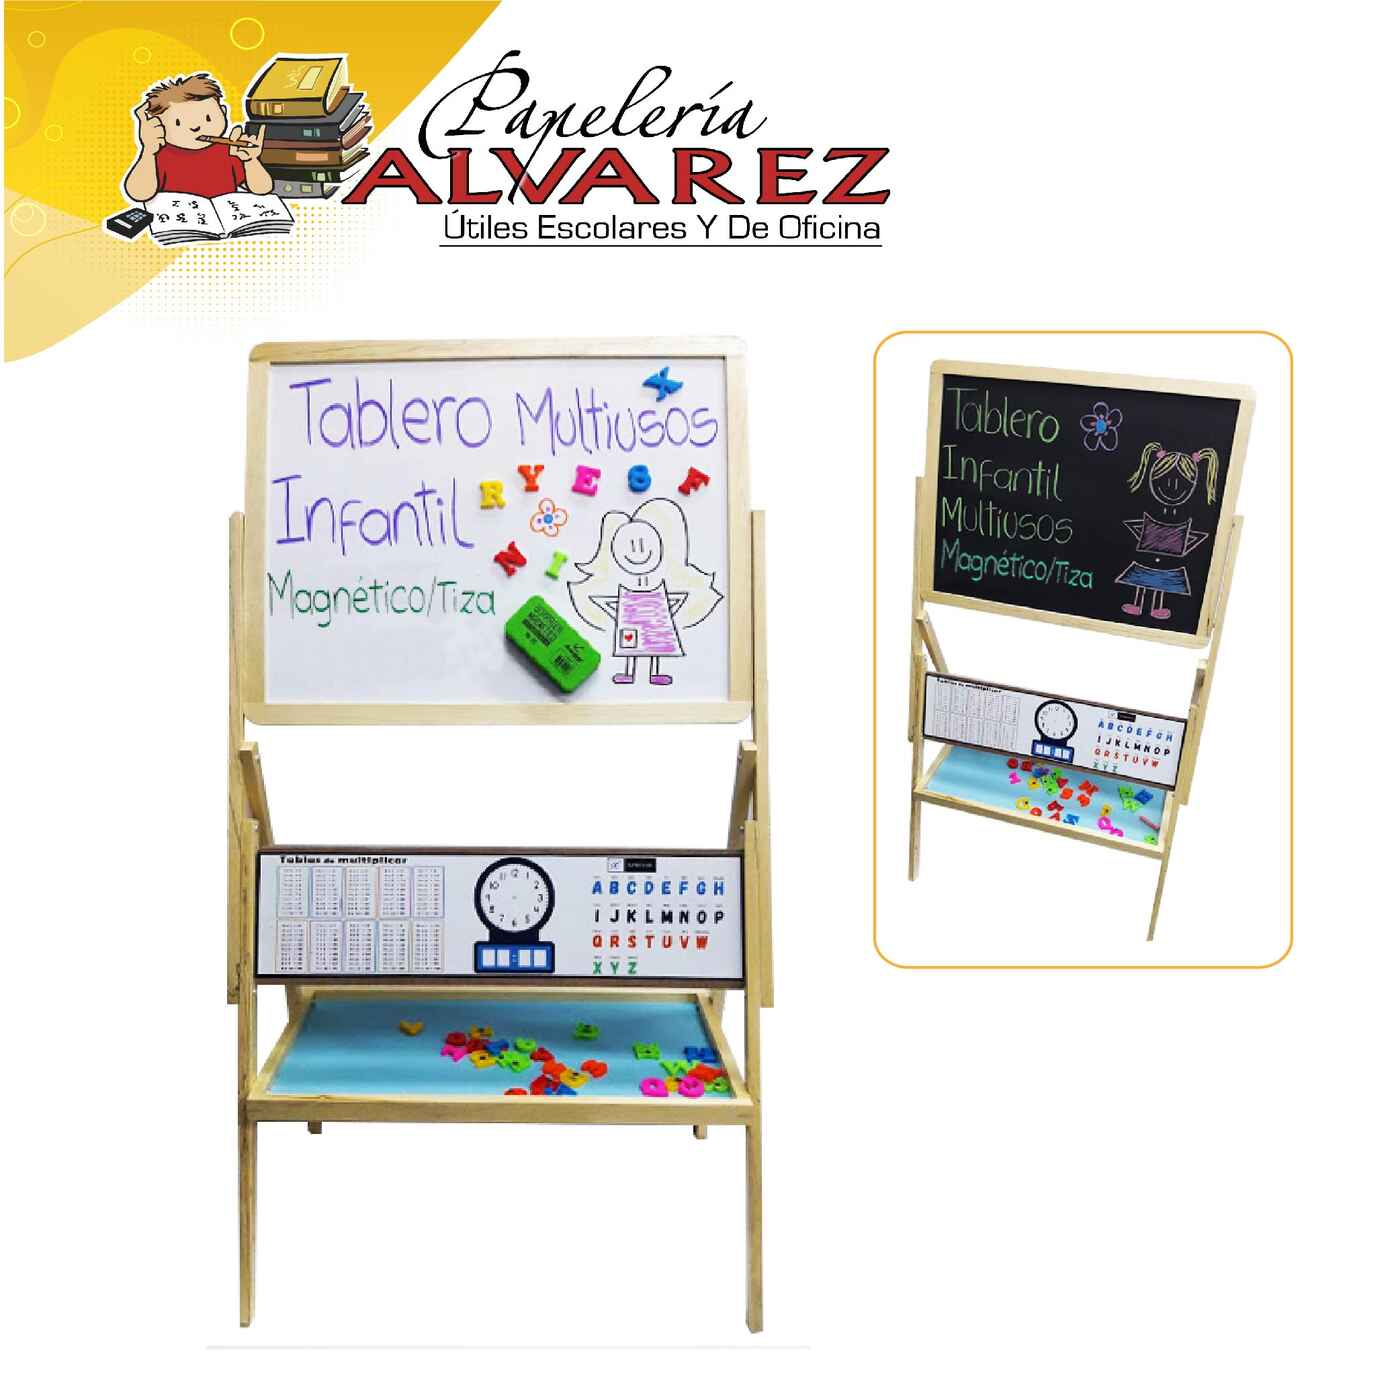 TABLERO XPRESART MAGNETICO/TIZA INFANTIL